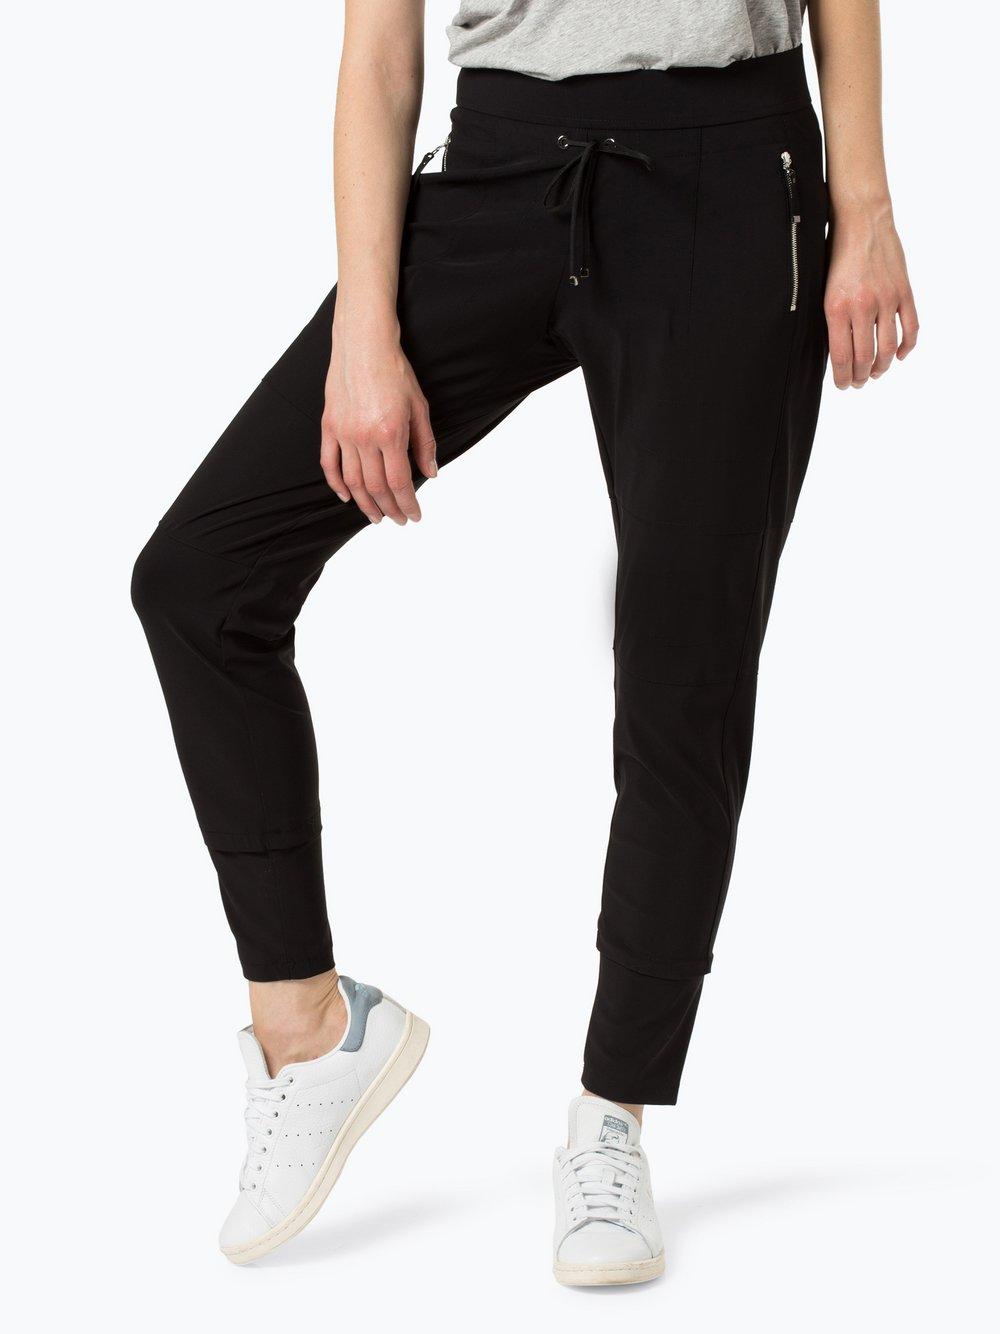 RAFFAELLO ROSSI – Spodnie damskie – Candy, czarny Van Graaf 414295-0001